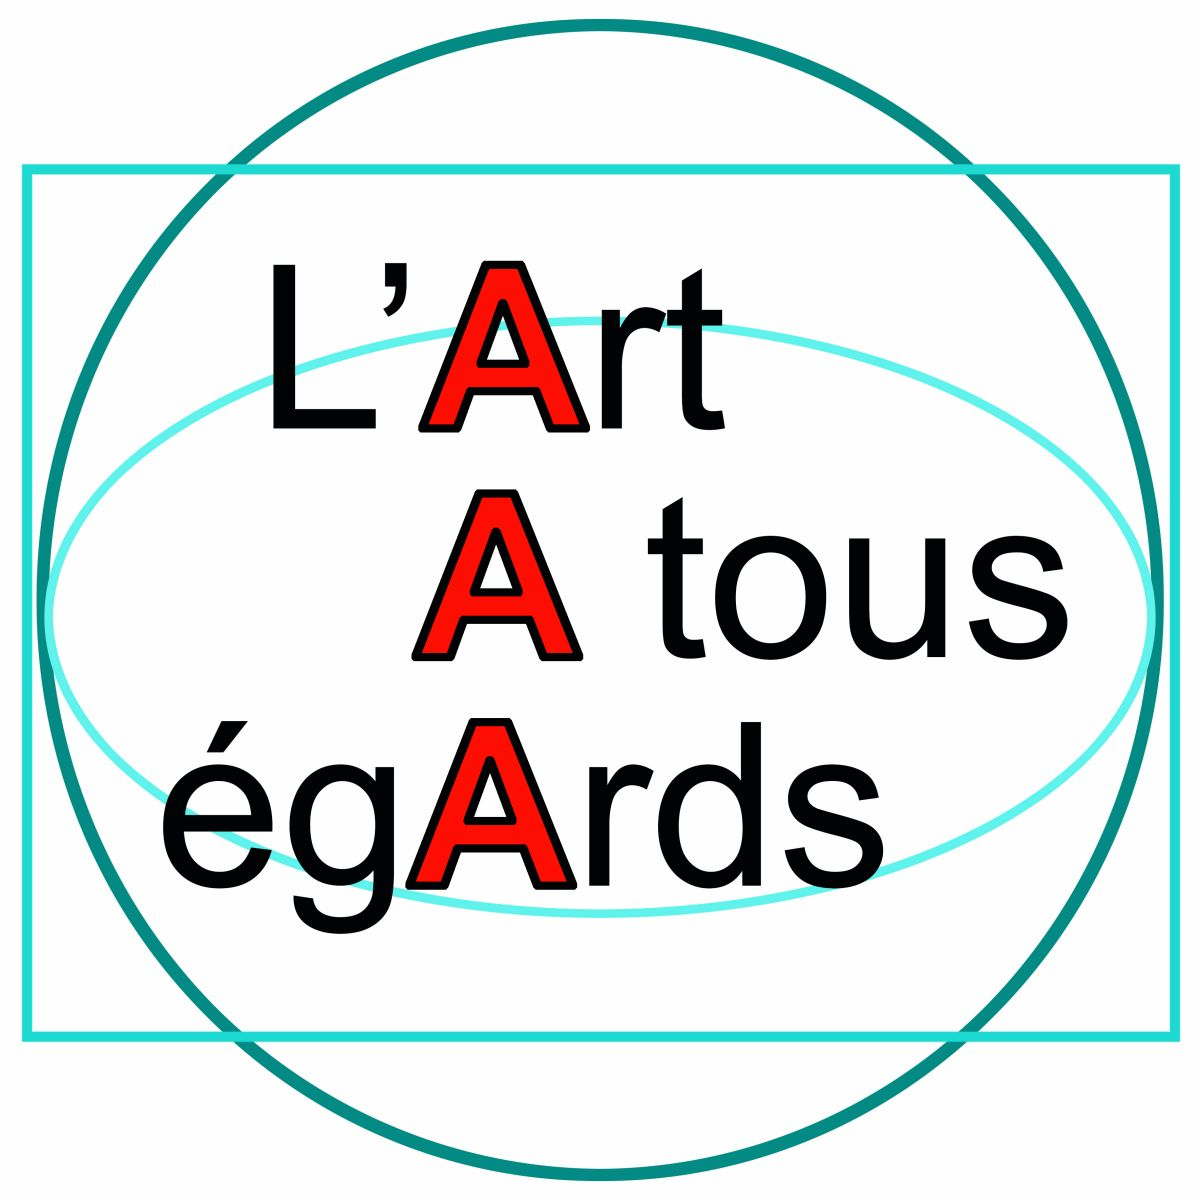 L'ART A TOUS EGARDS